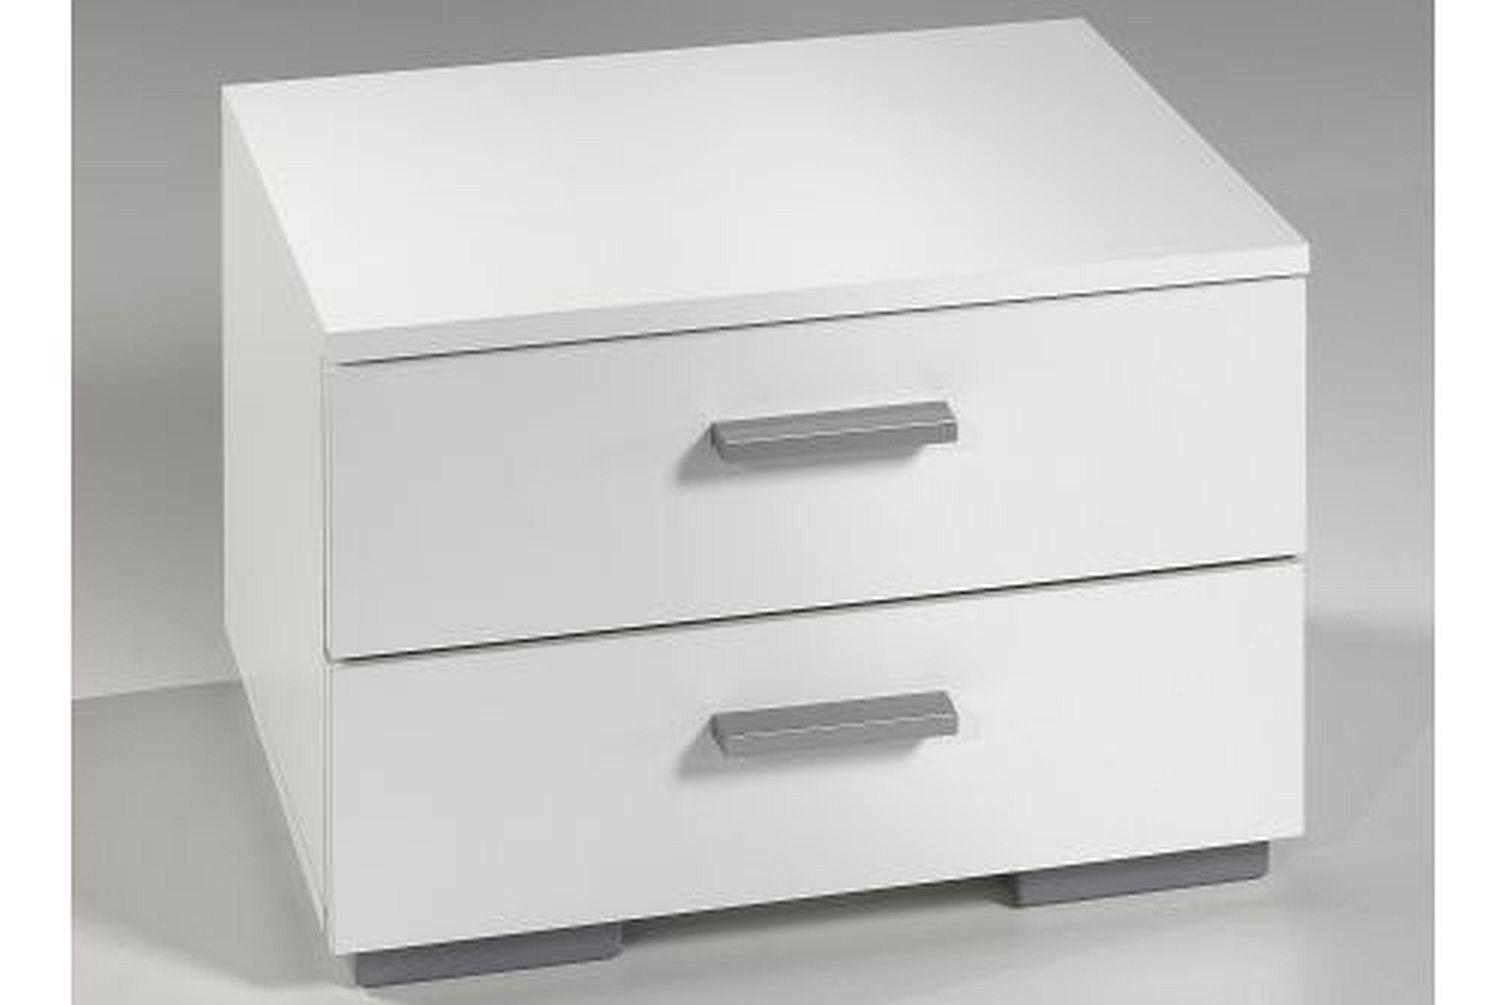 nako two kommode 0802 02 weiss matt online kaufen. Black Bedroom Furniture Sets. Home Design Ideas